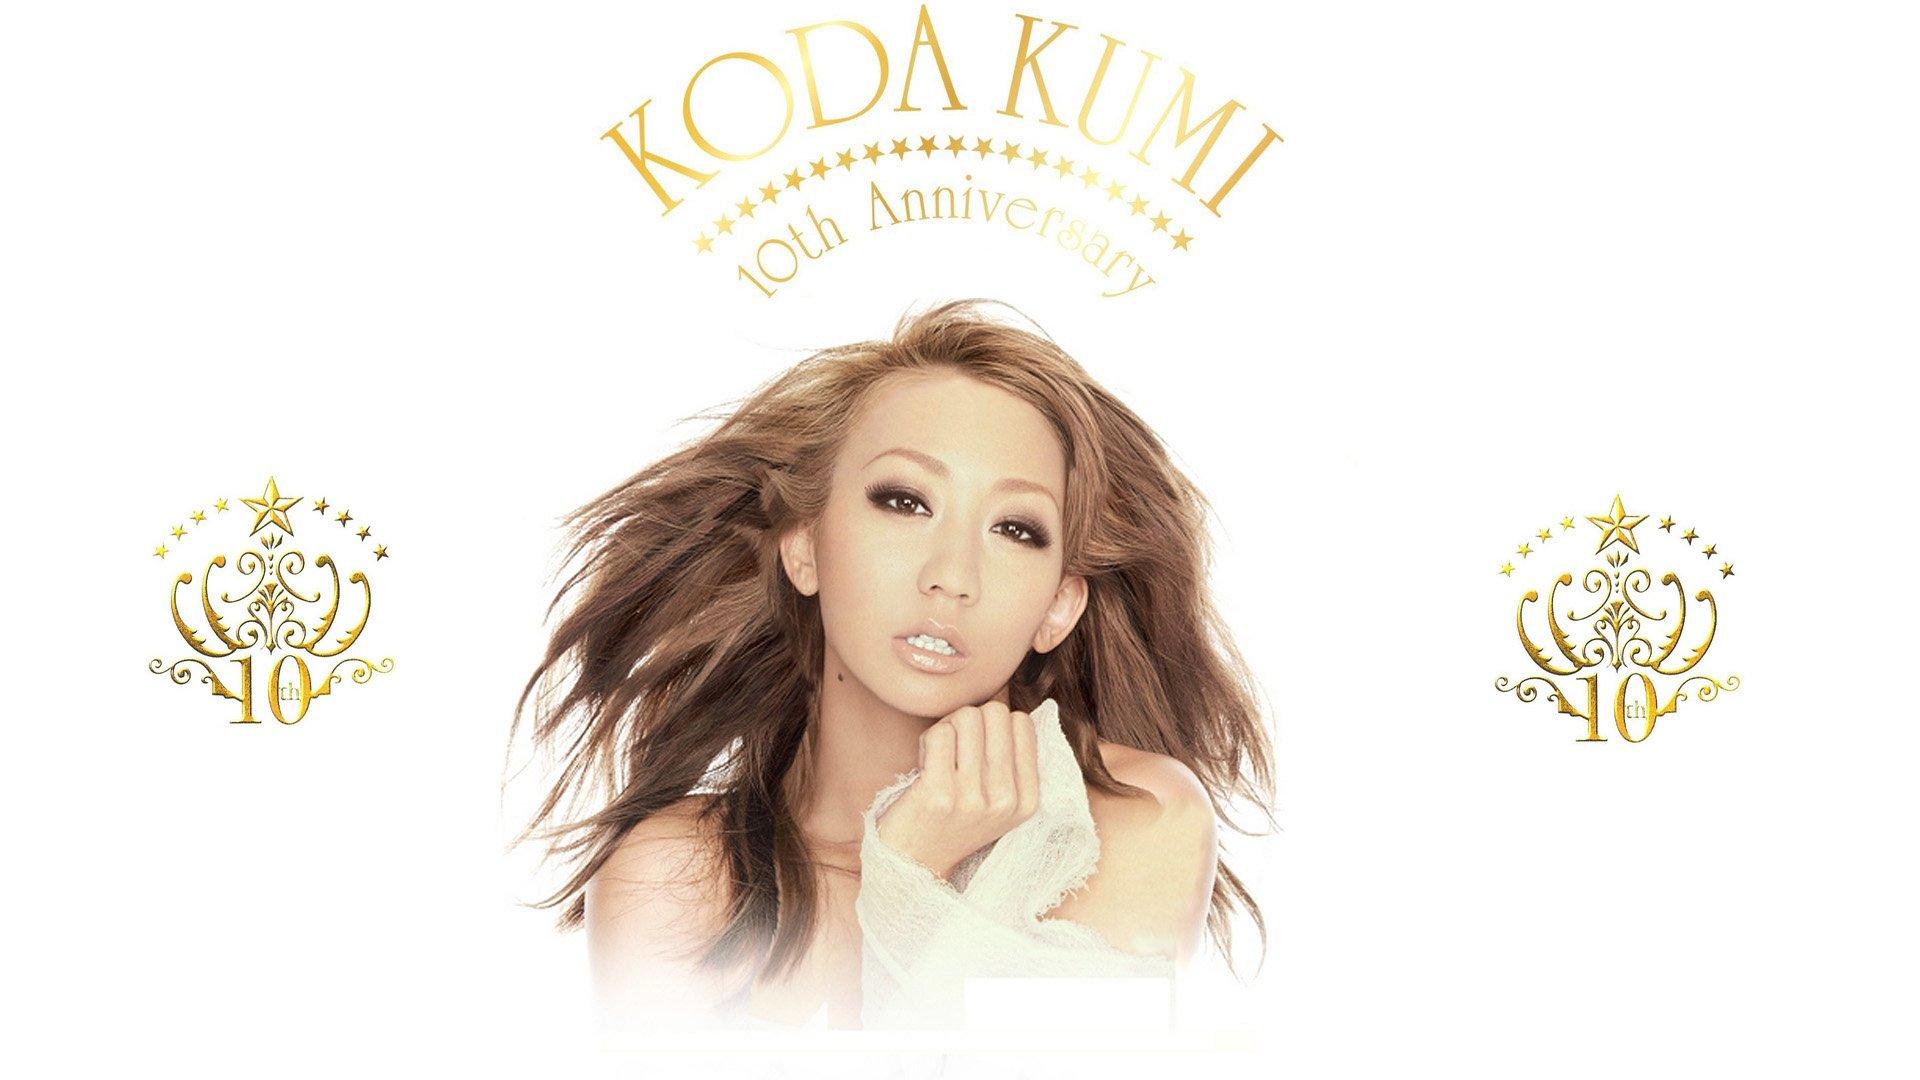 Kumi Koda Hd Wallpaper Background Image 1920x1080 Id 152454